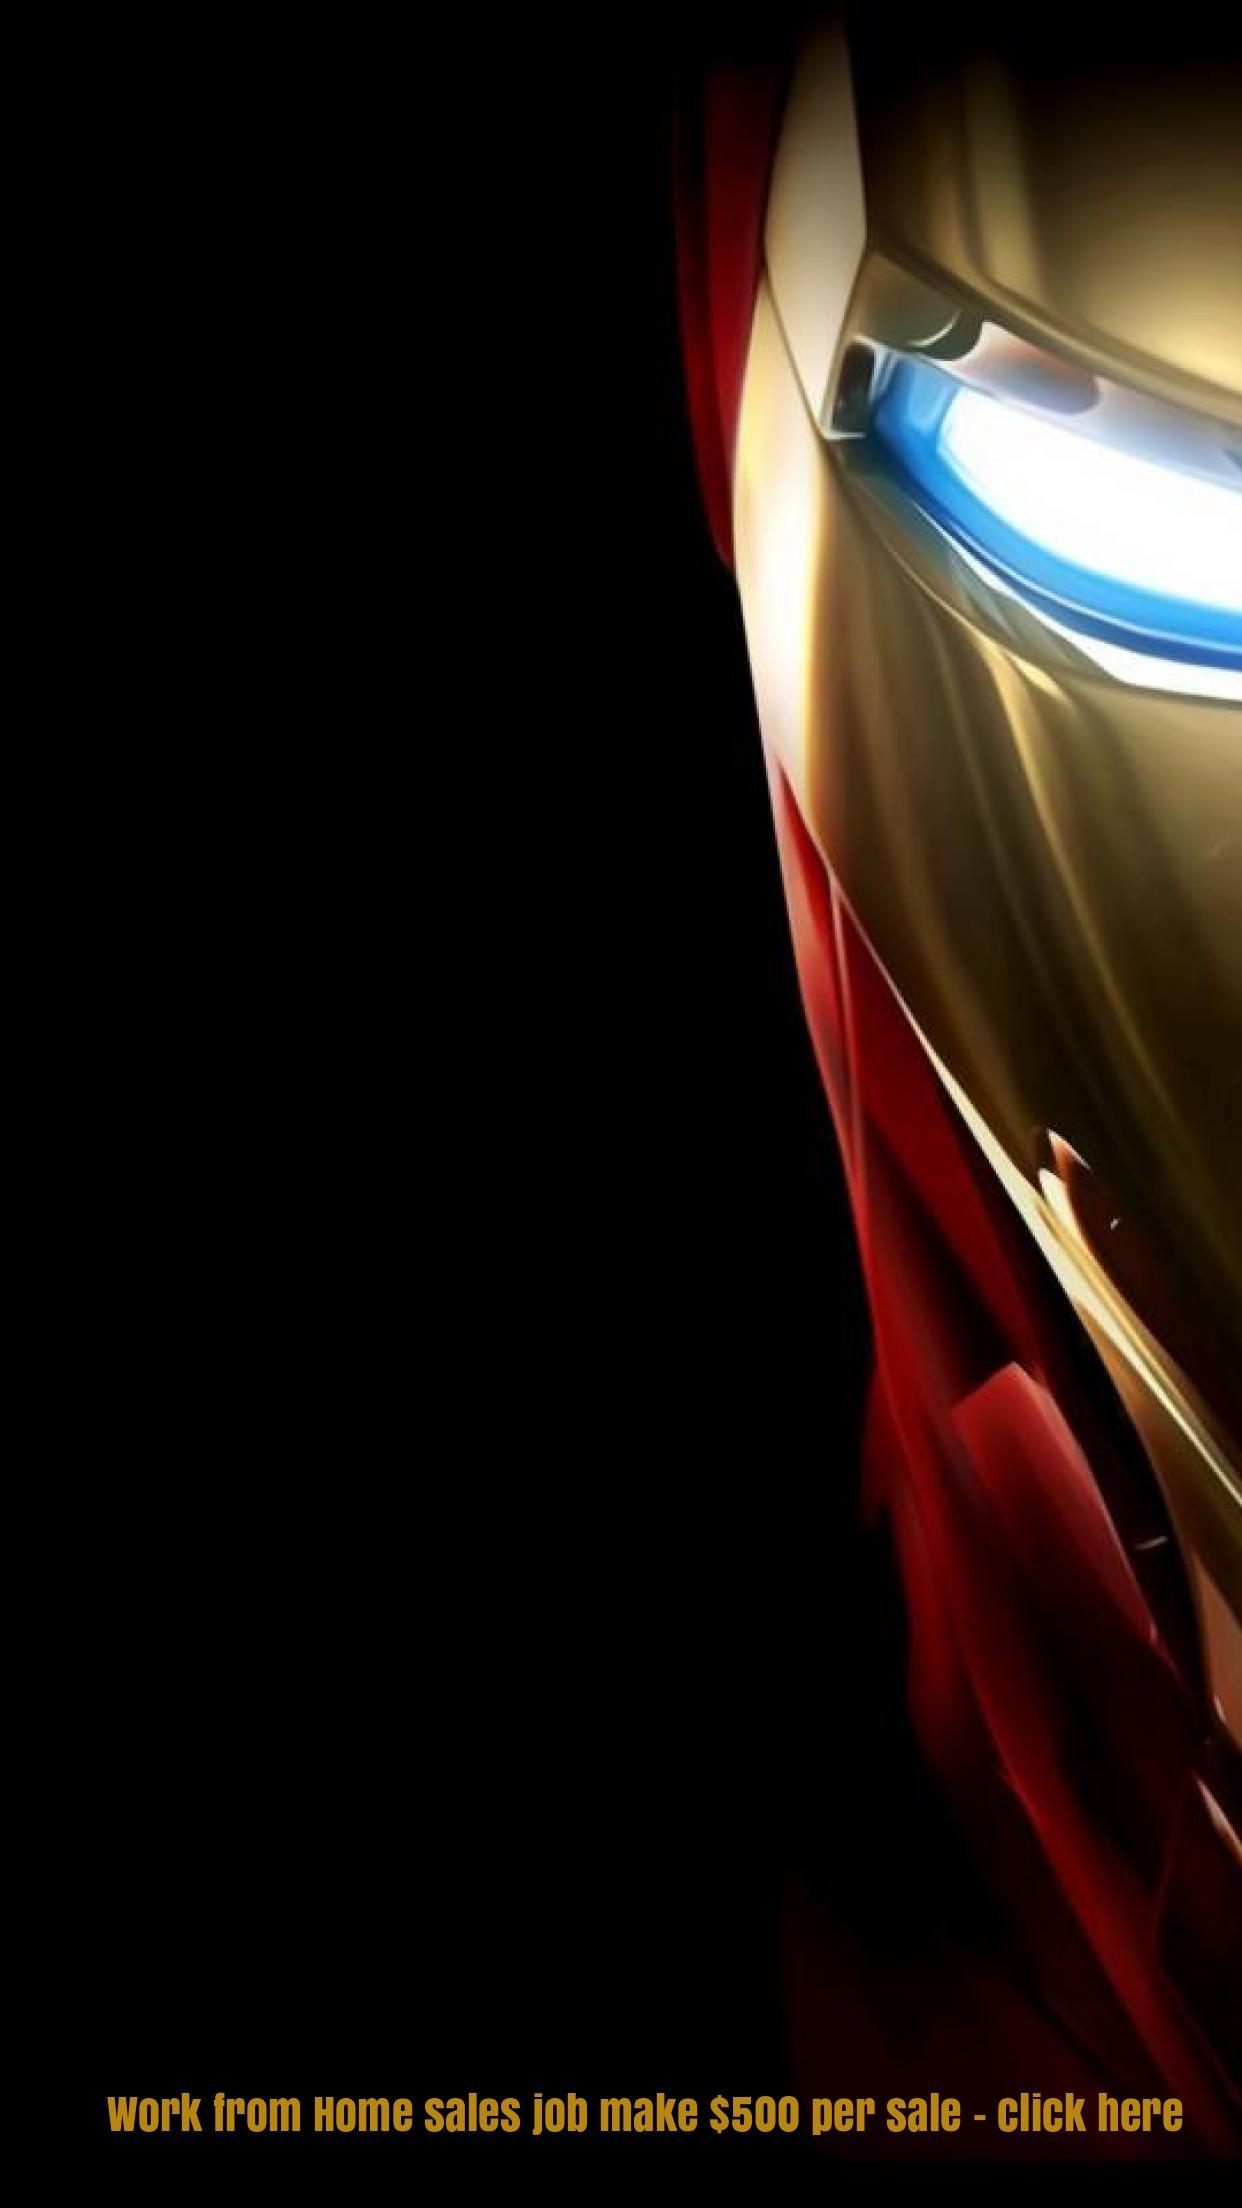 Iron Man Wallpaper 34447: Super Heroes And Villains Comic Books